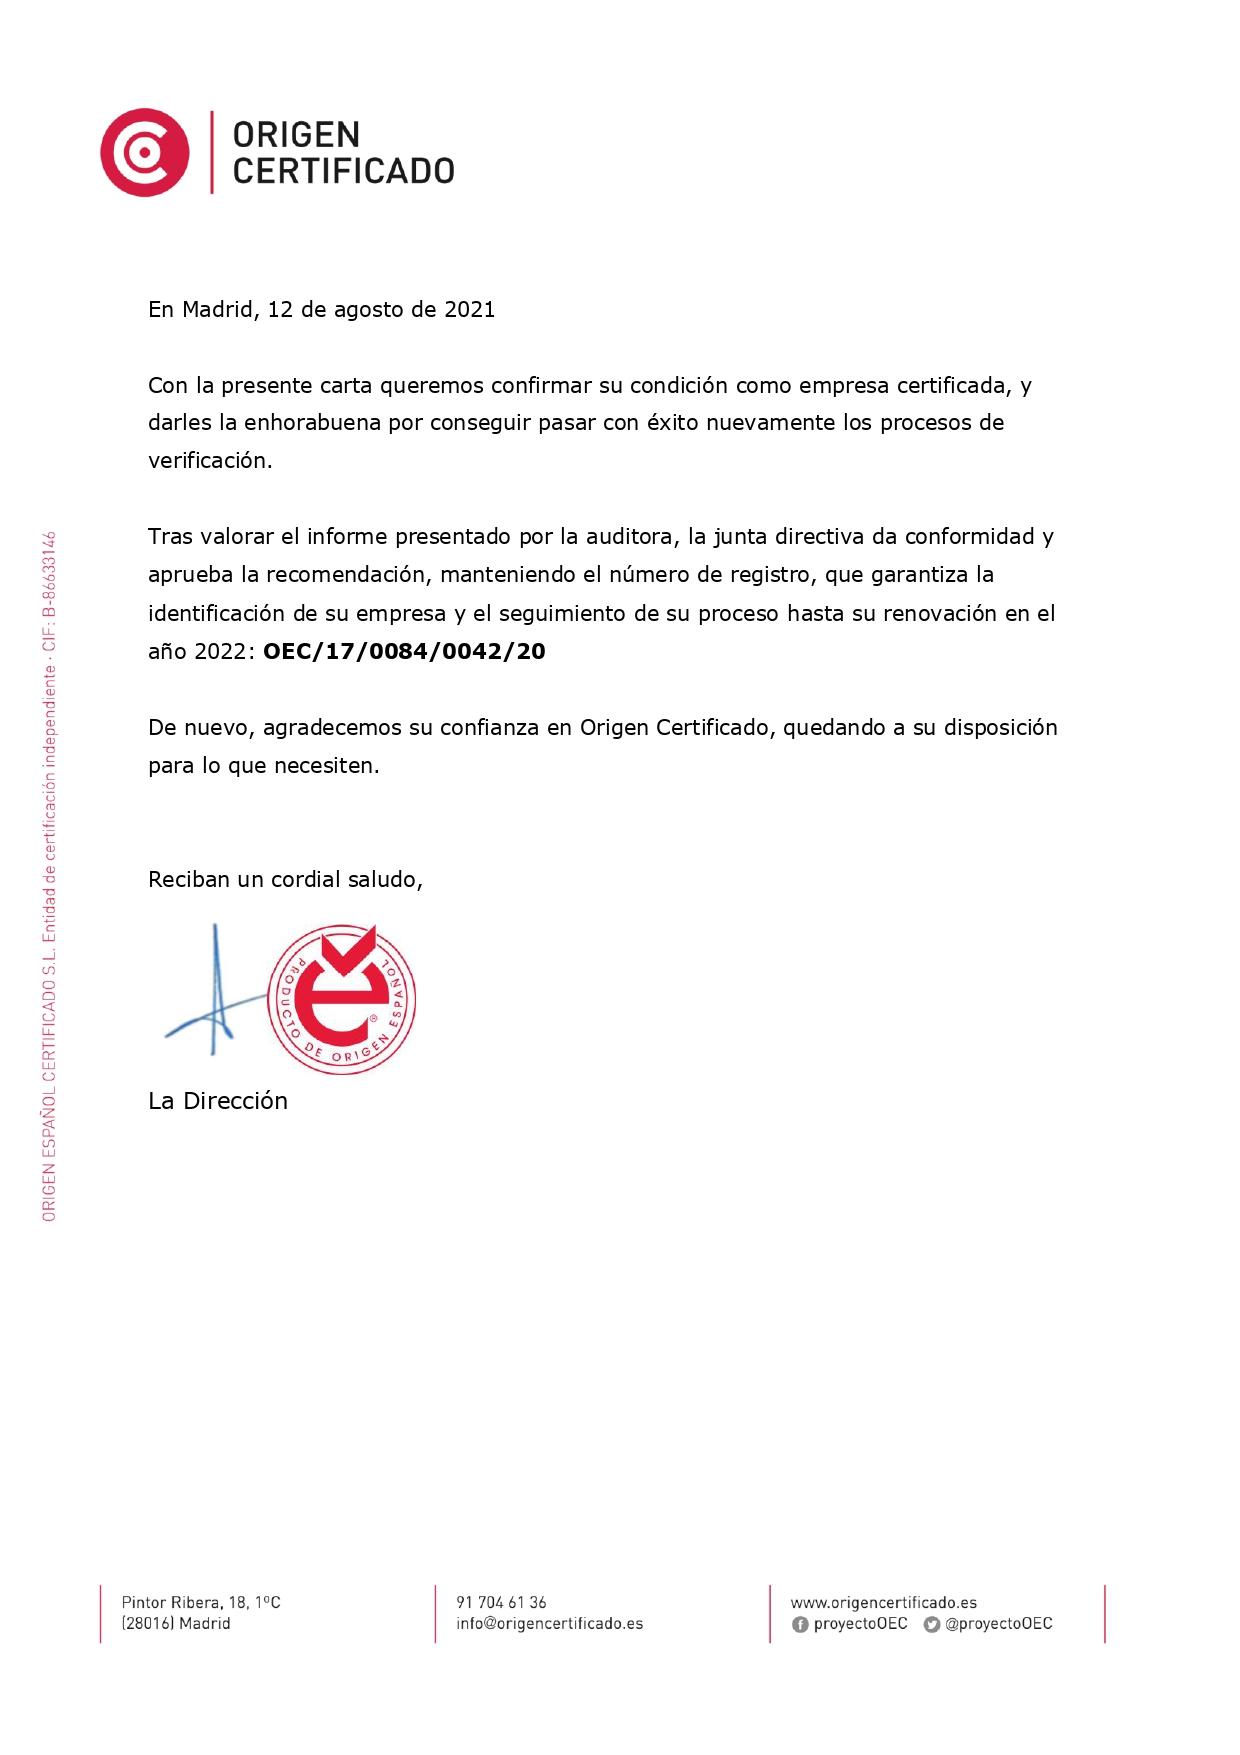 Certificado OEC de que Guiotarars Raimundo fabrica guitarras 100% en España